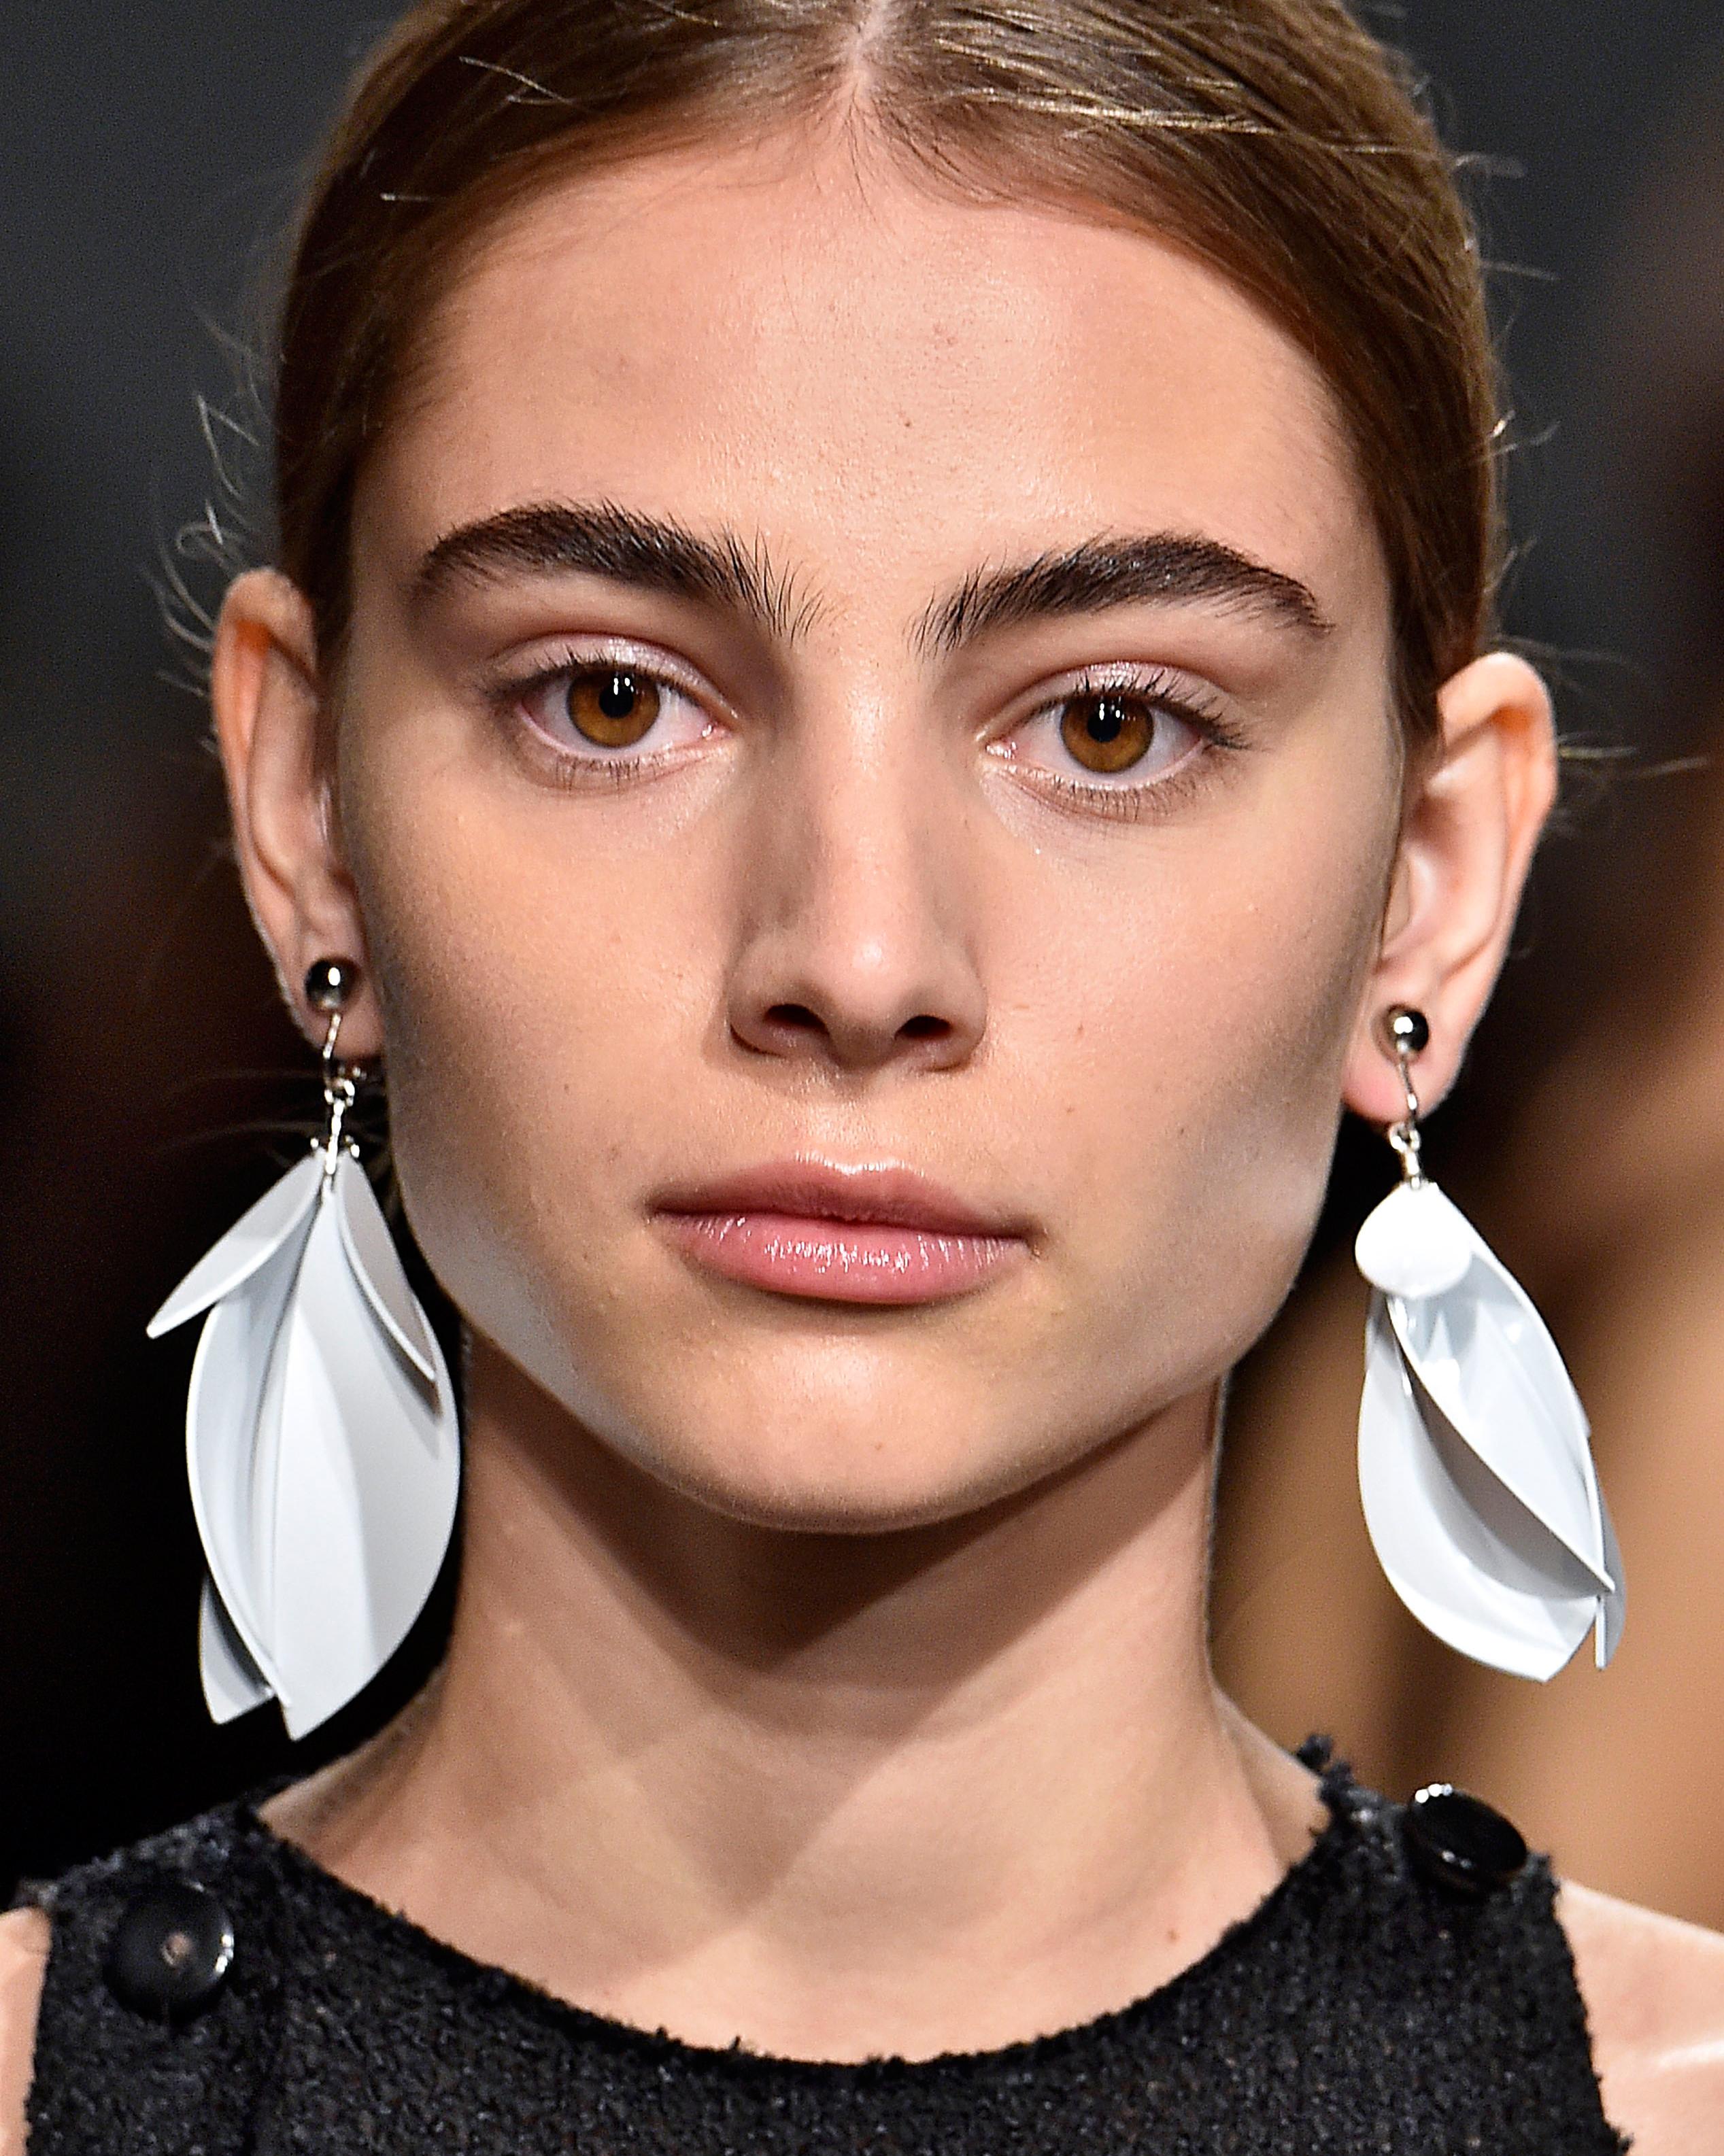 sp16-nyfw-bridal-accessories-proenza-schouler-earrings-0915.jpg